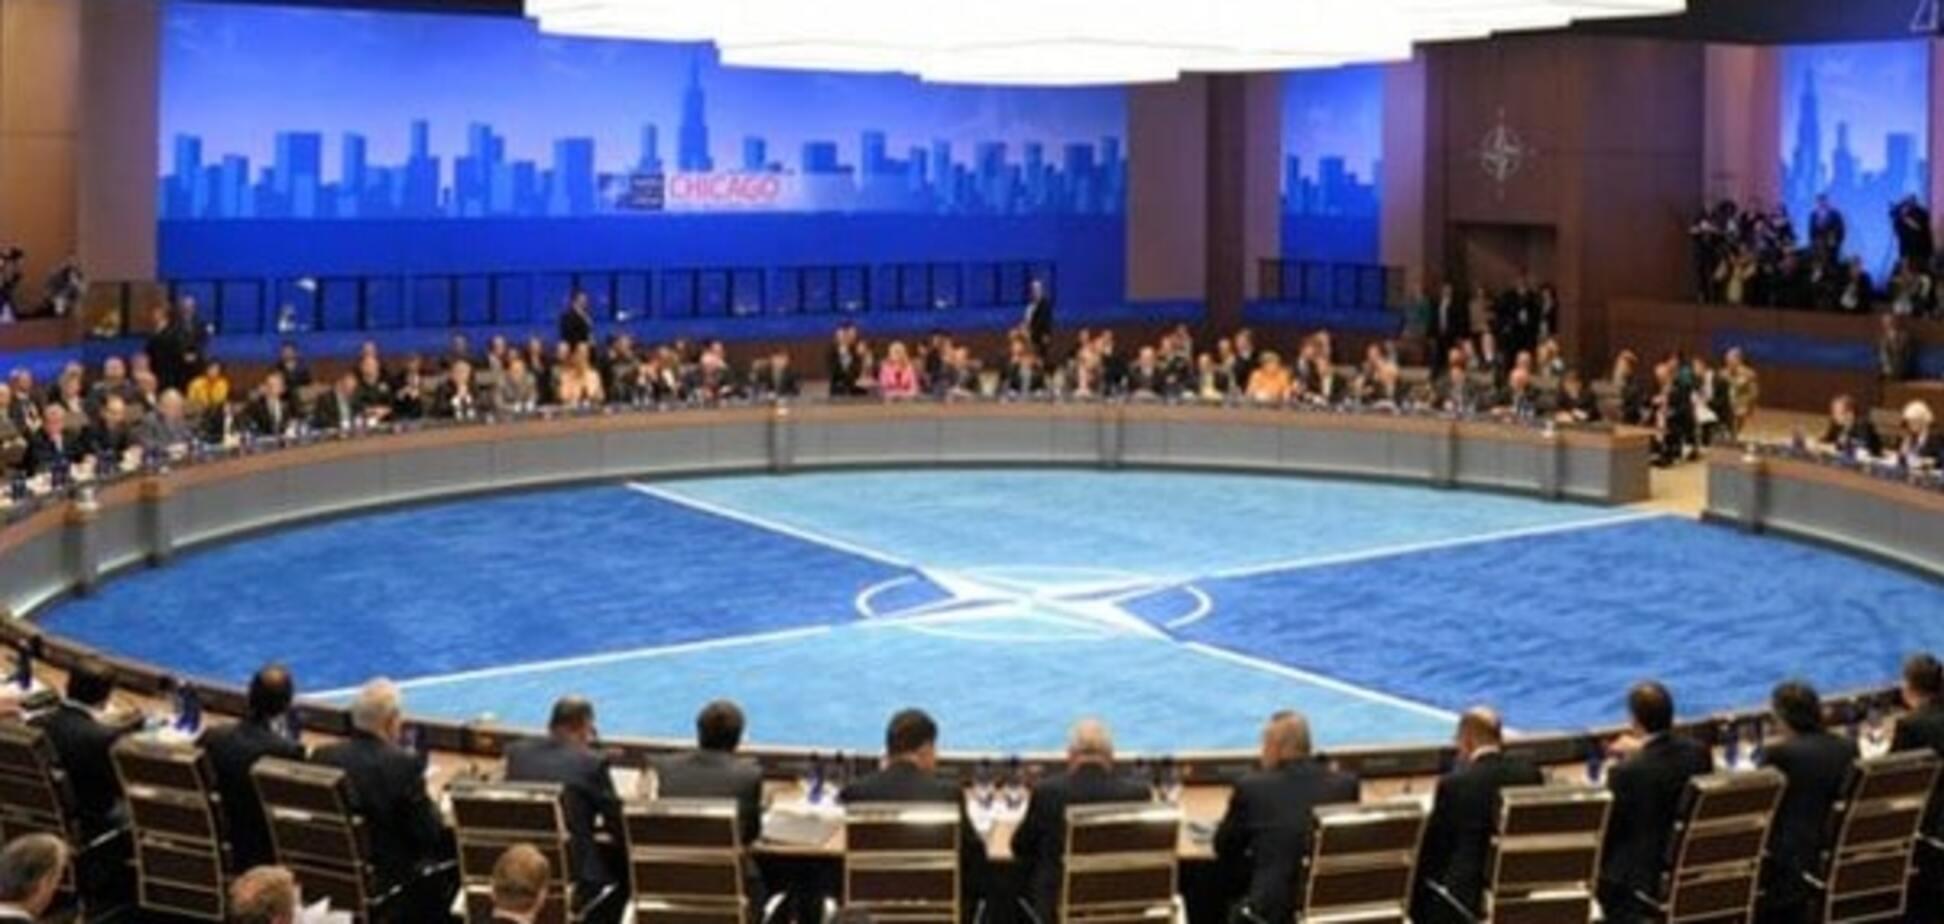 На саммите НАТО в Варшаве могут предъявить доказательства российского терроризма – Арестович